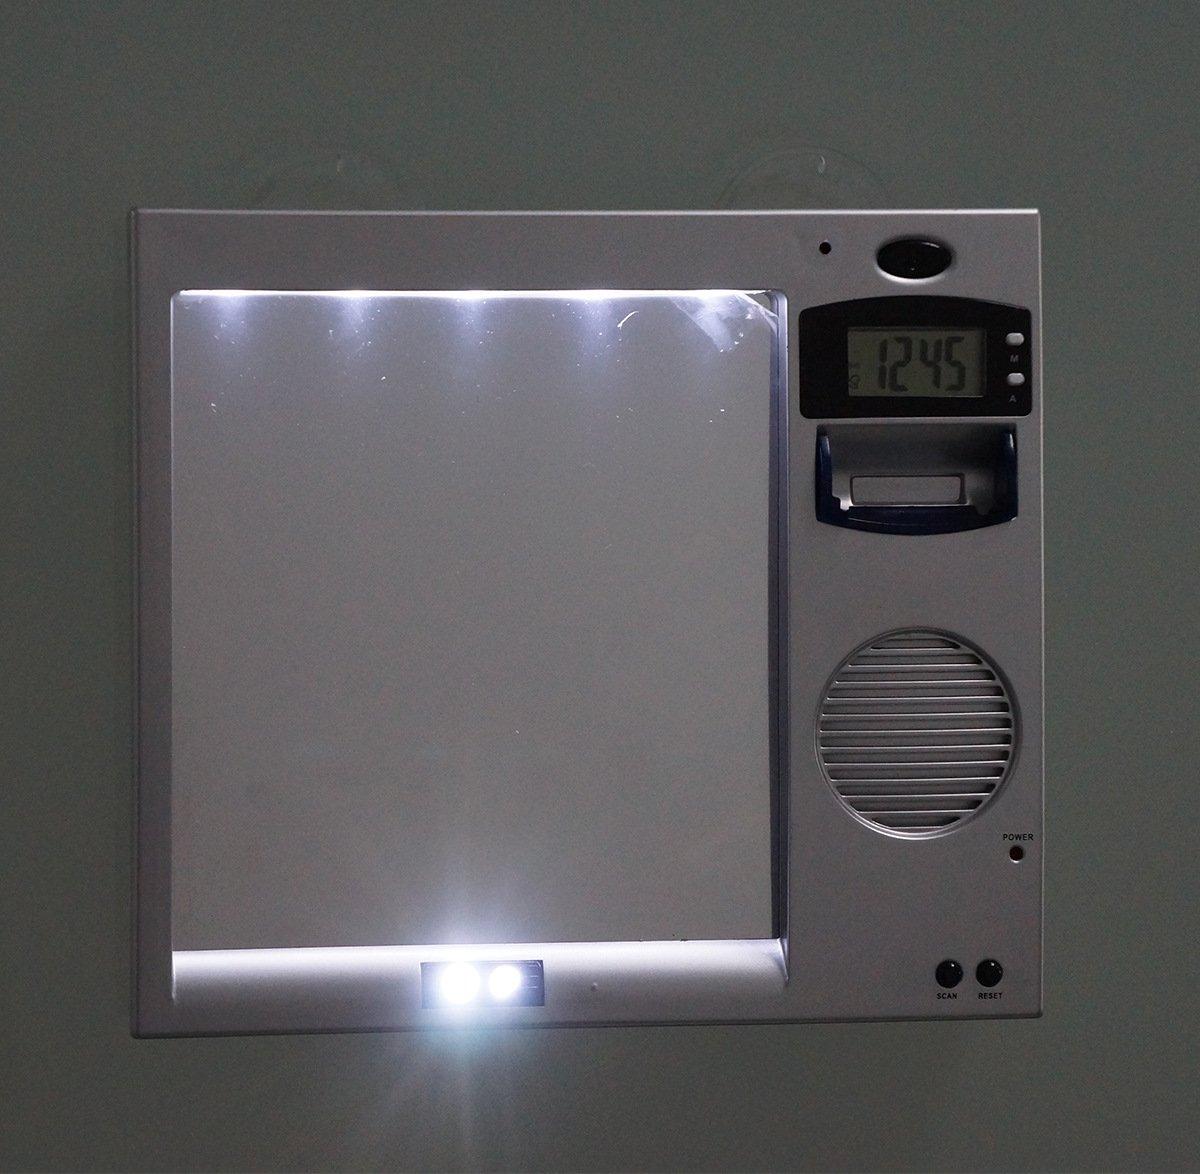 Amazon.com: Led Shaving Mirror Anti-Fog Lighted Shaver Mirror Combination  Shelf & Clock & Radio Fogless Mirror Led Lights For Bathroom Shower Room  Shaver ...